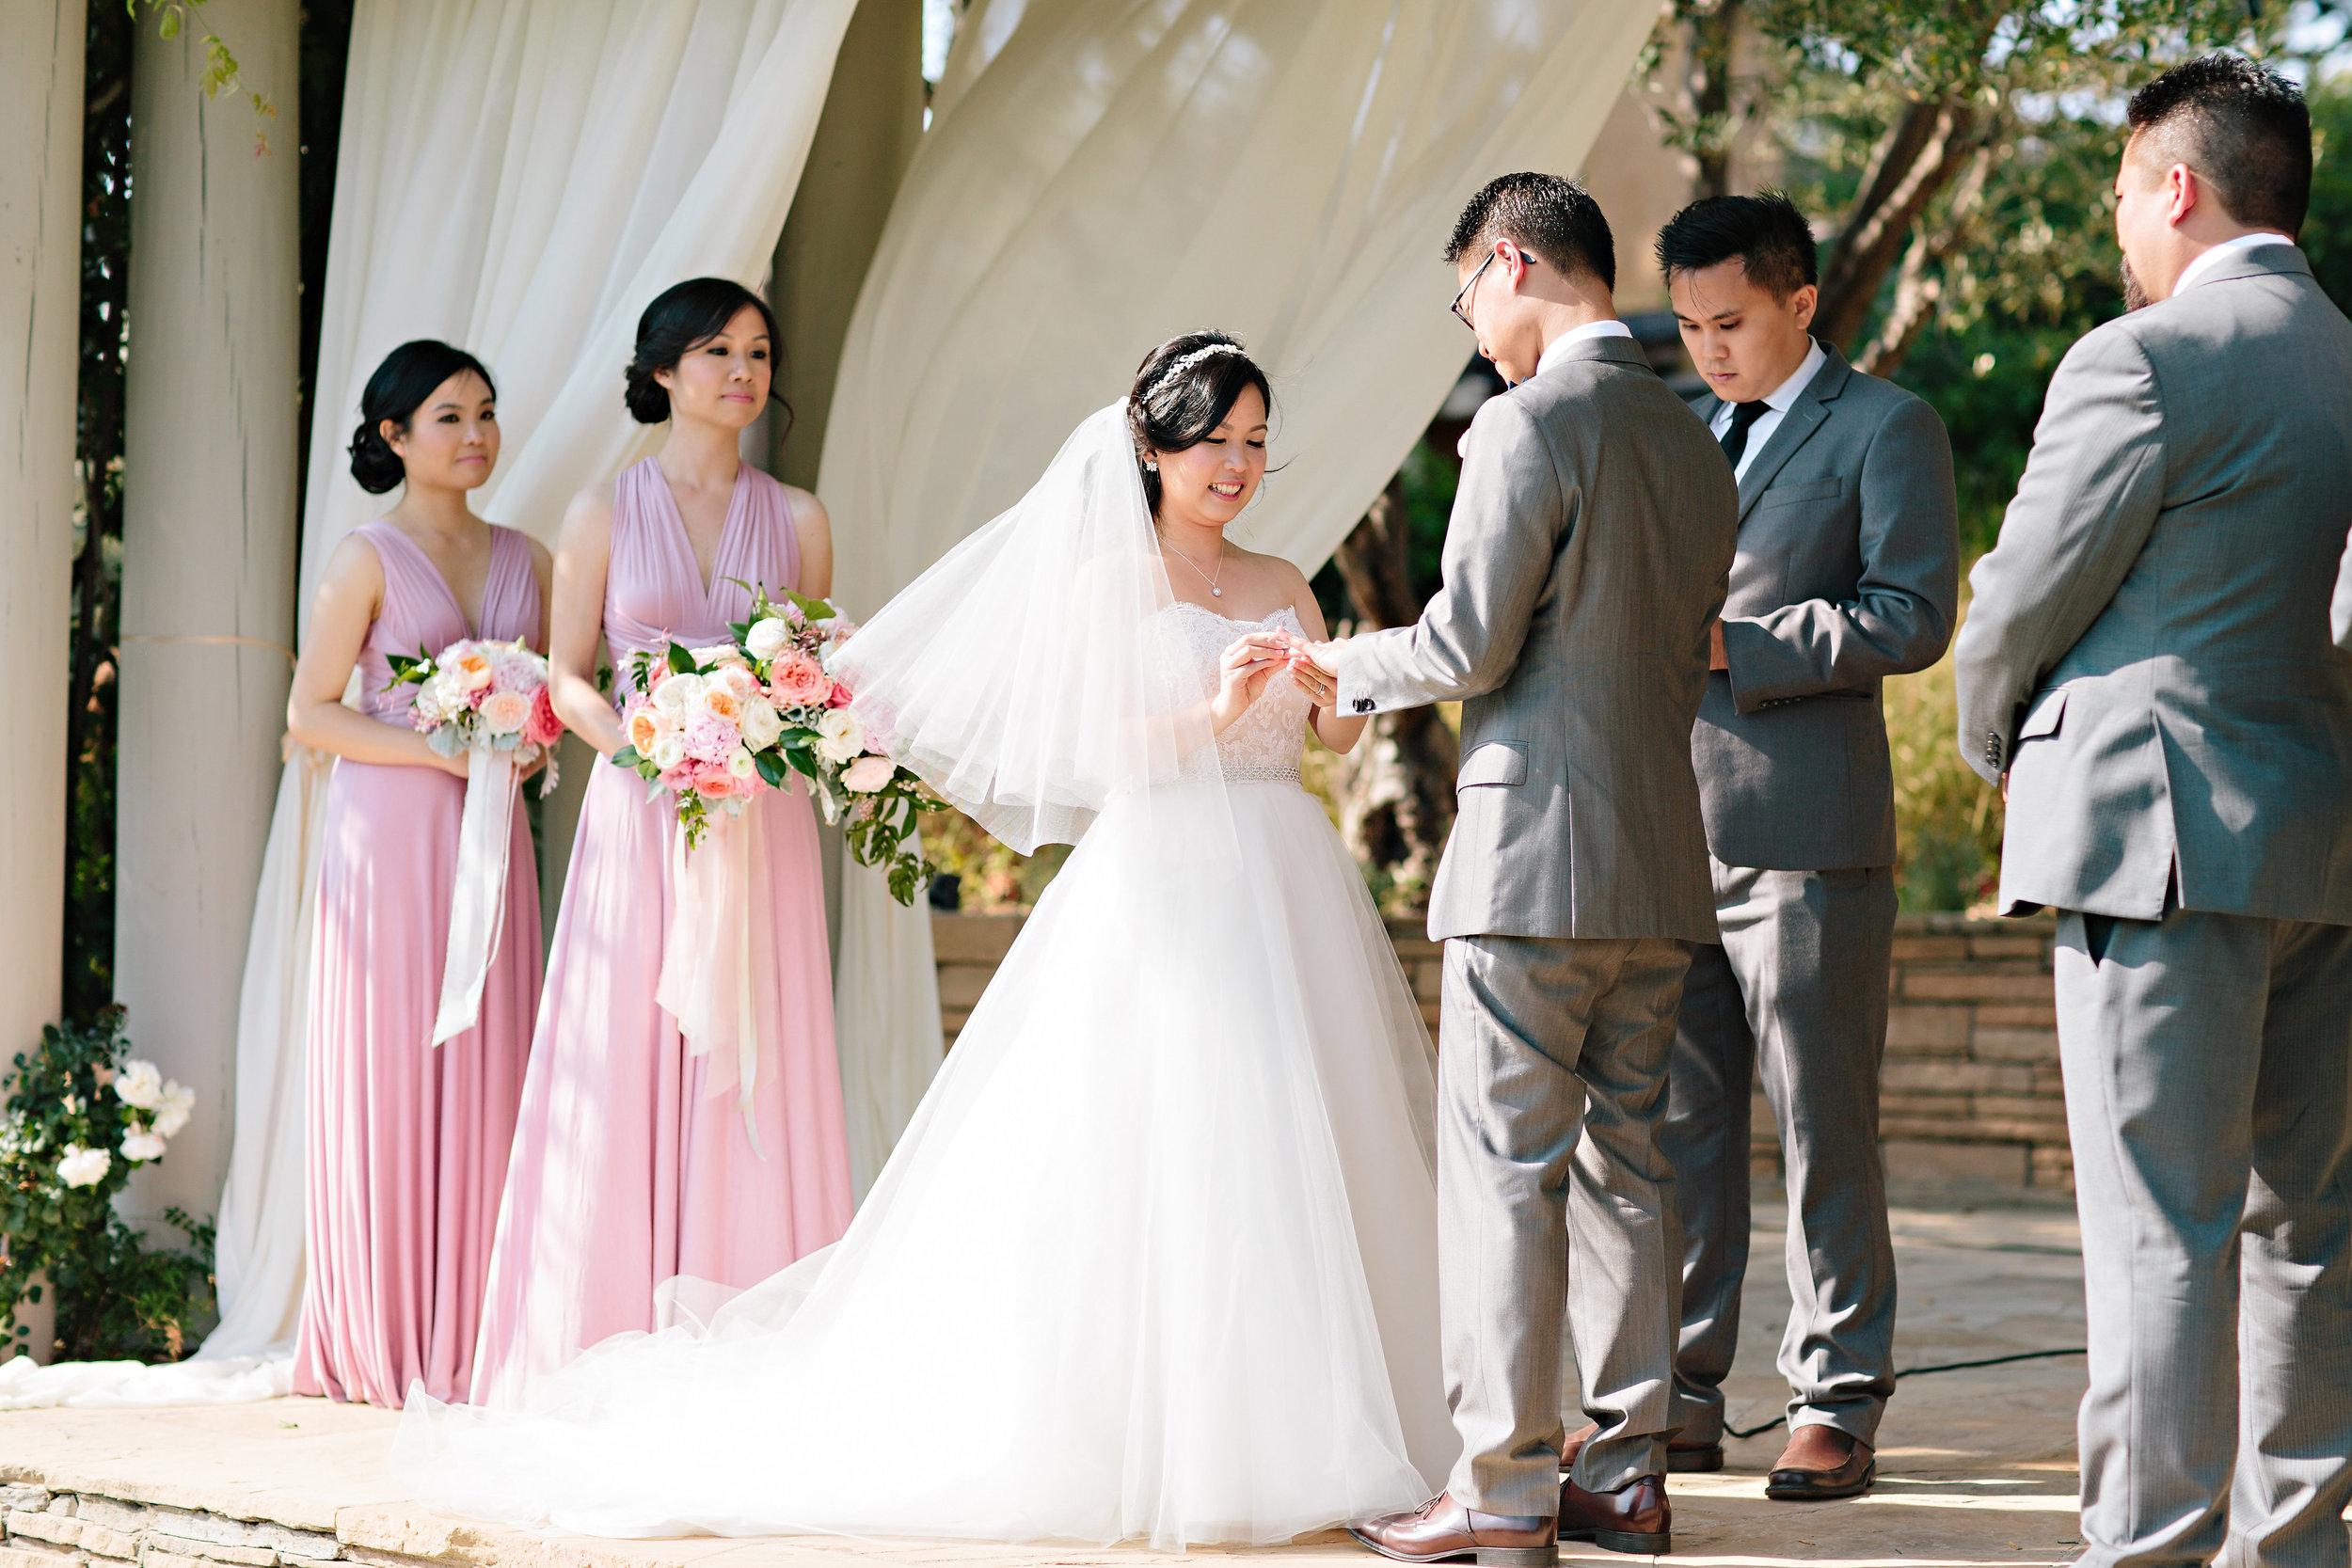 Ceremony-0397.jpg